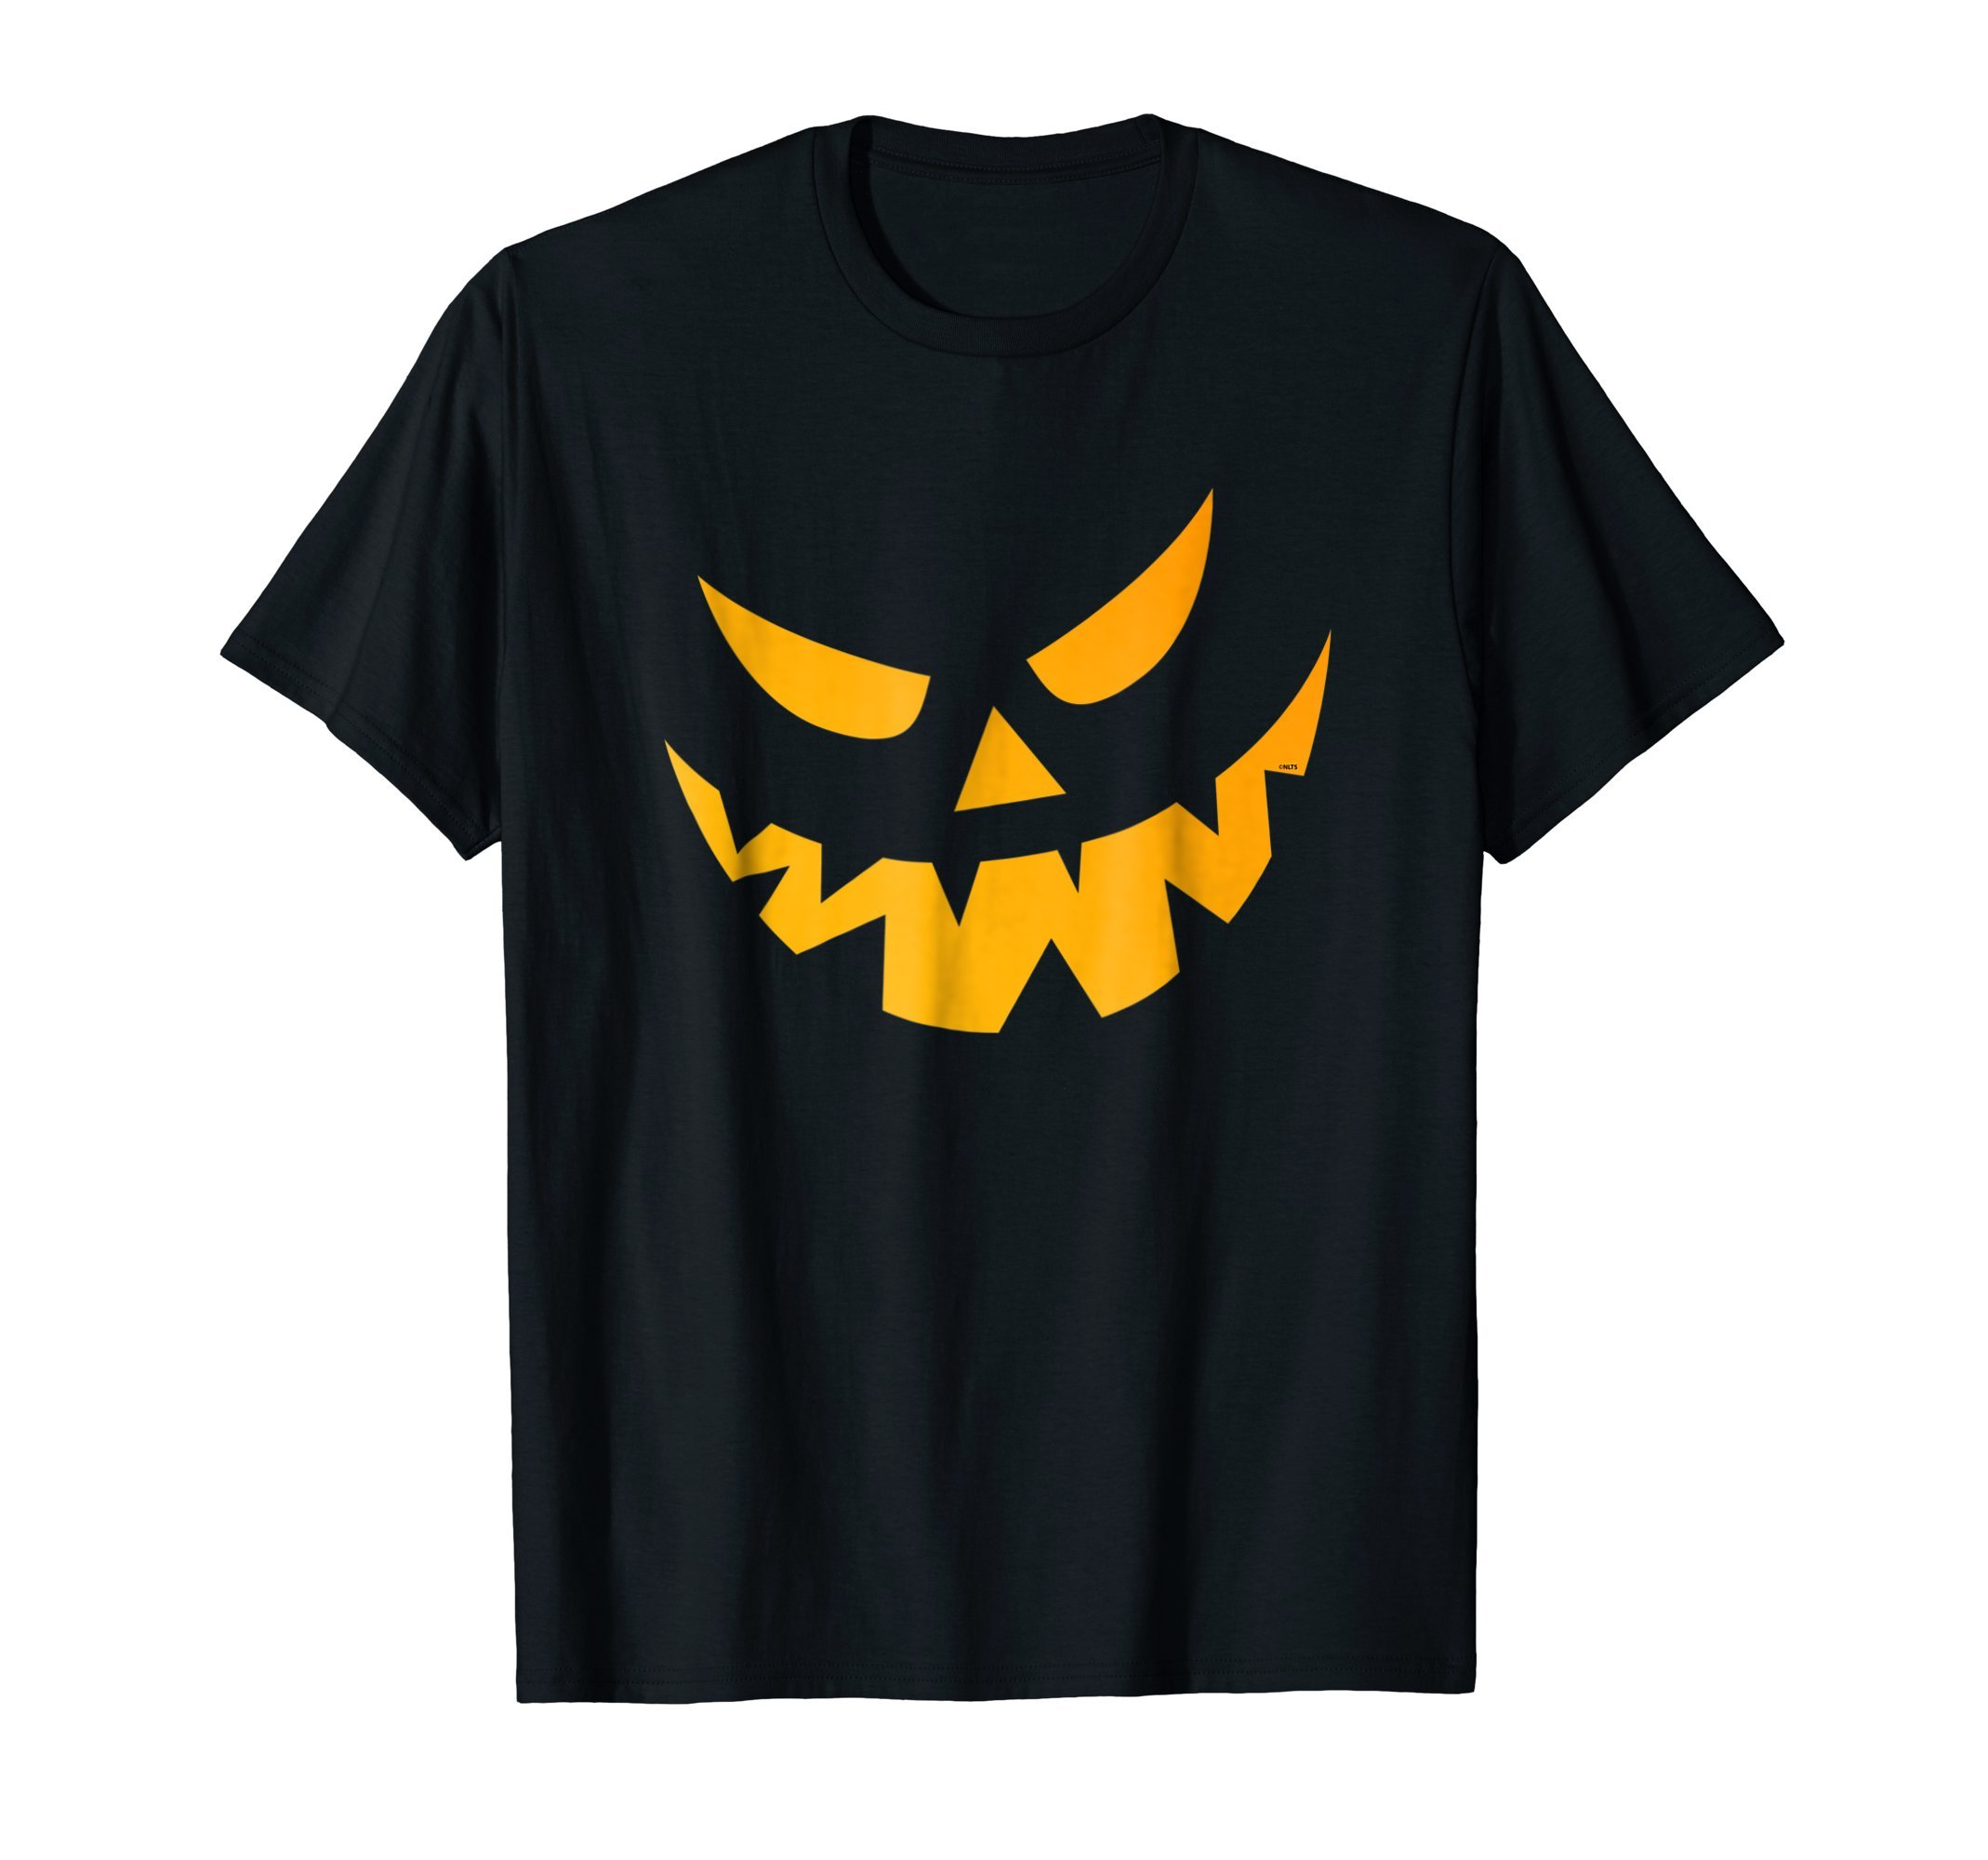 Grinning-Pumpkin-Funny-Halloween-costume-T-Shirt-Tee-Gift